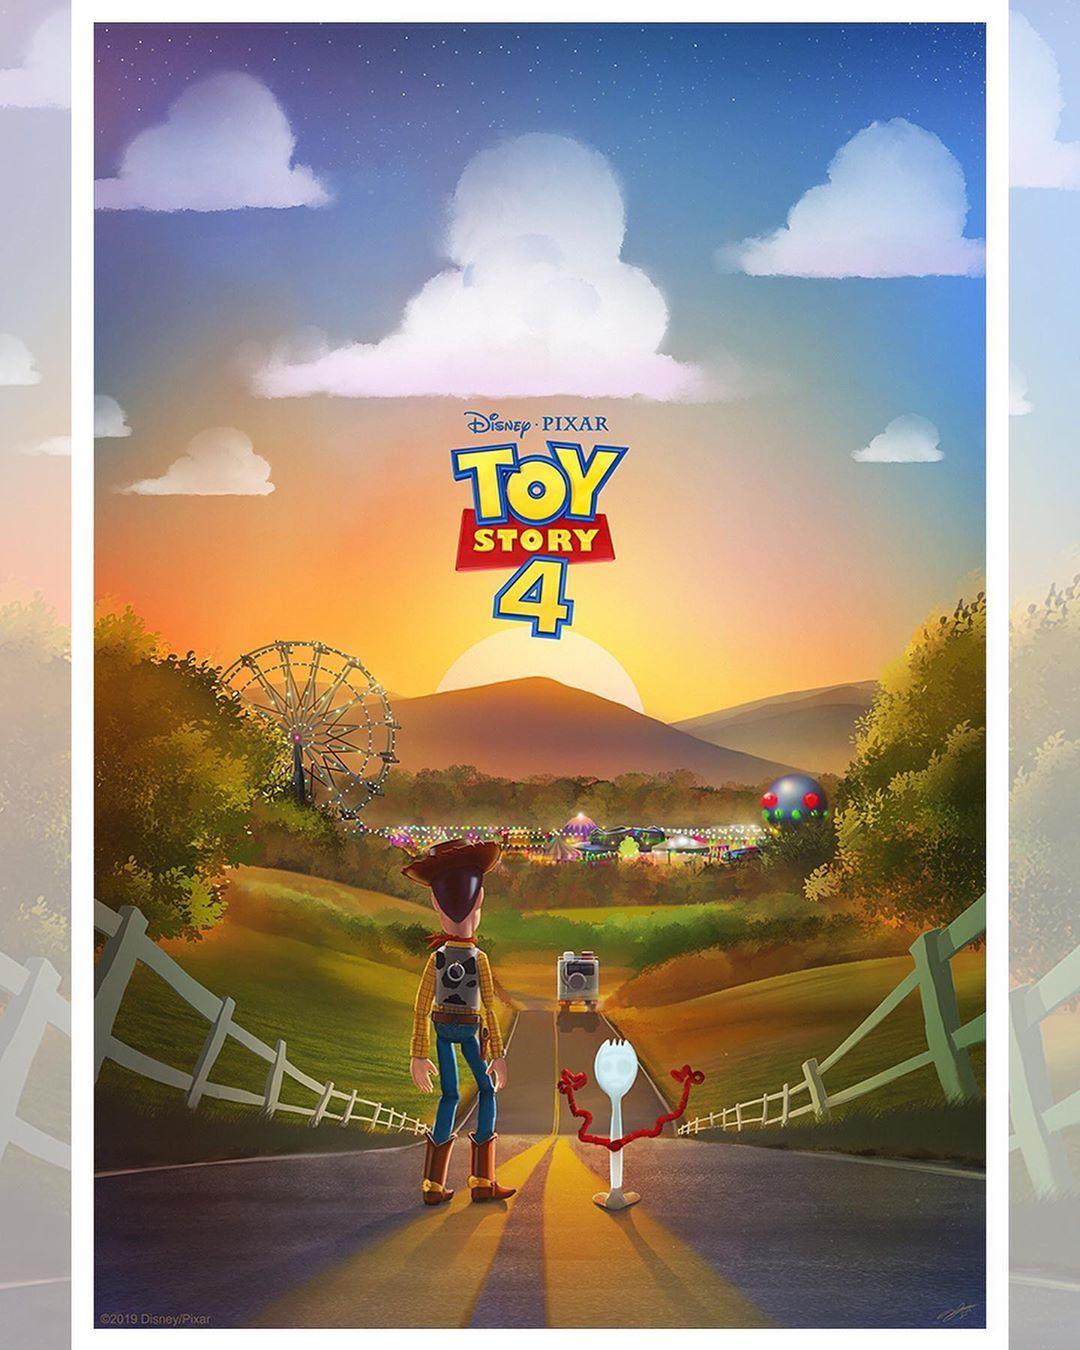 Toy Story 4 Fondos de pantalla de películas, Fondos de